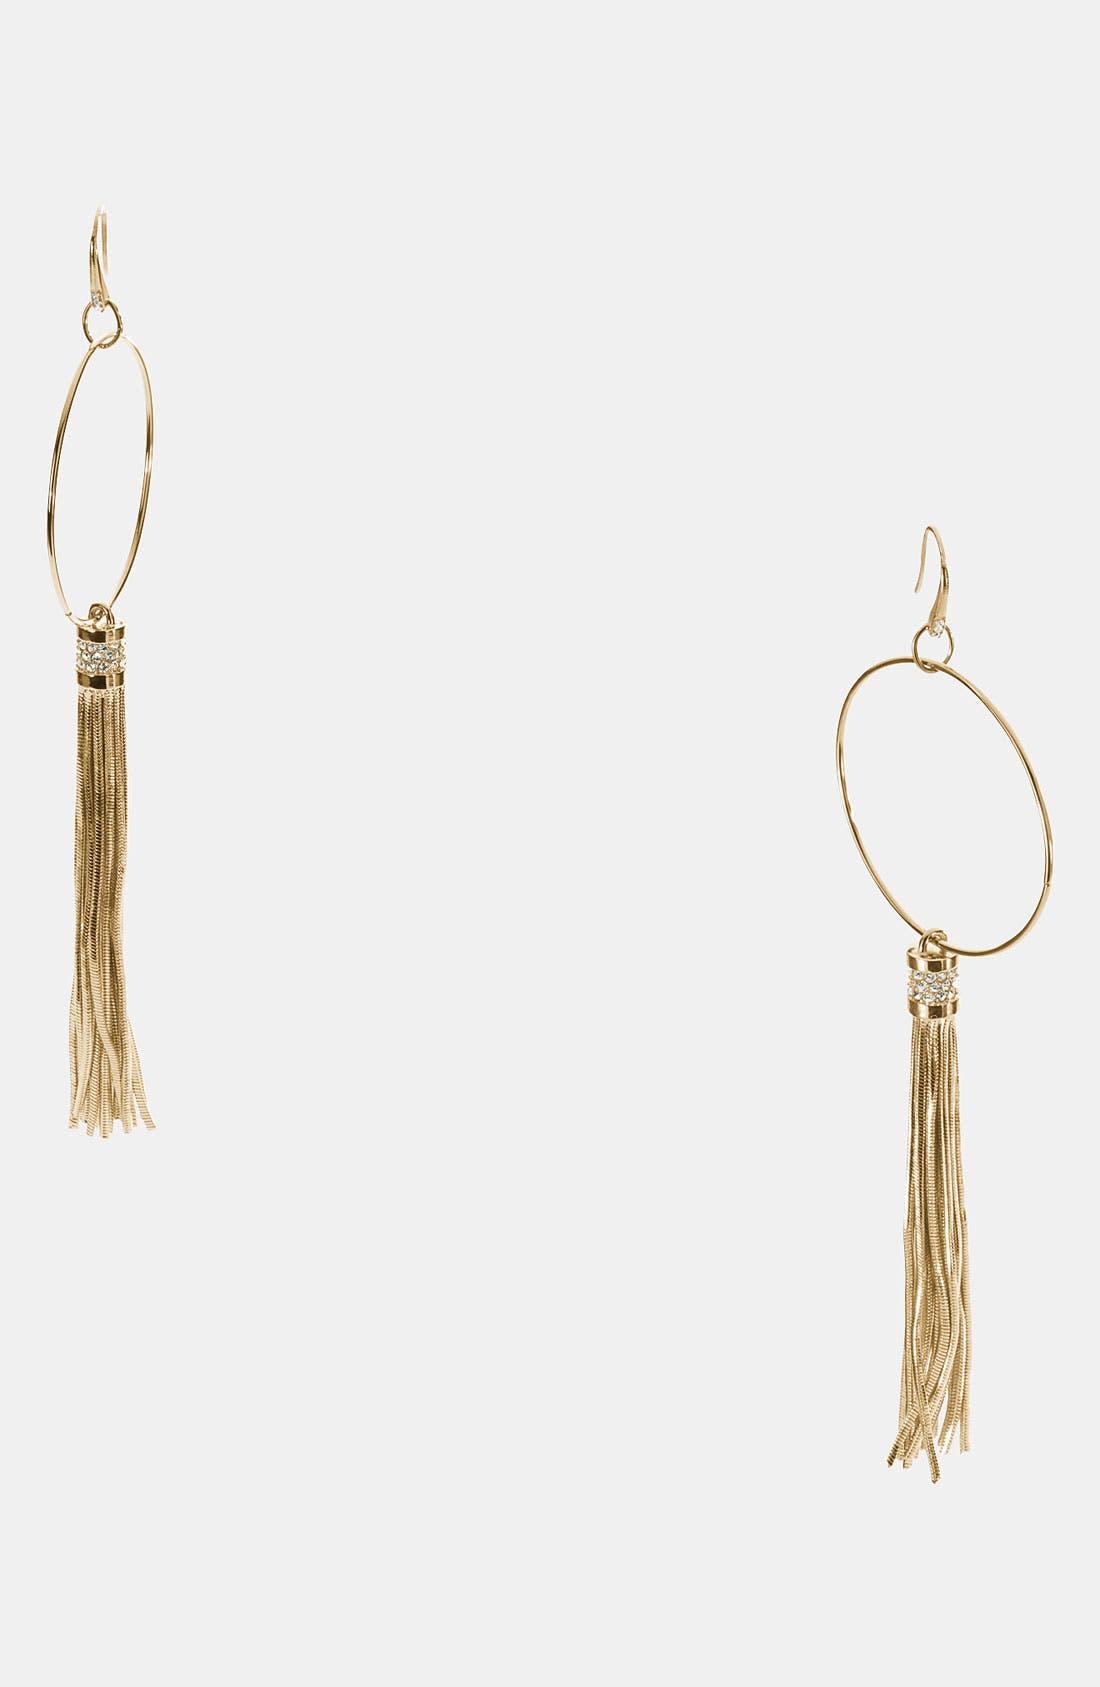 Main Image - Michael Kors 'Equestrian Luxury' Linear Earrings